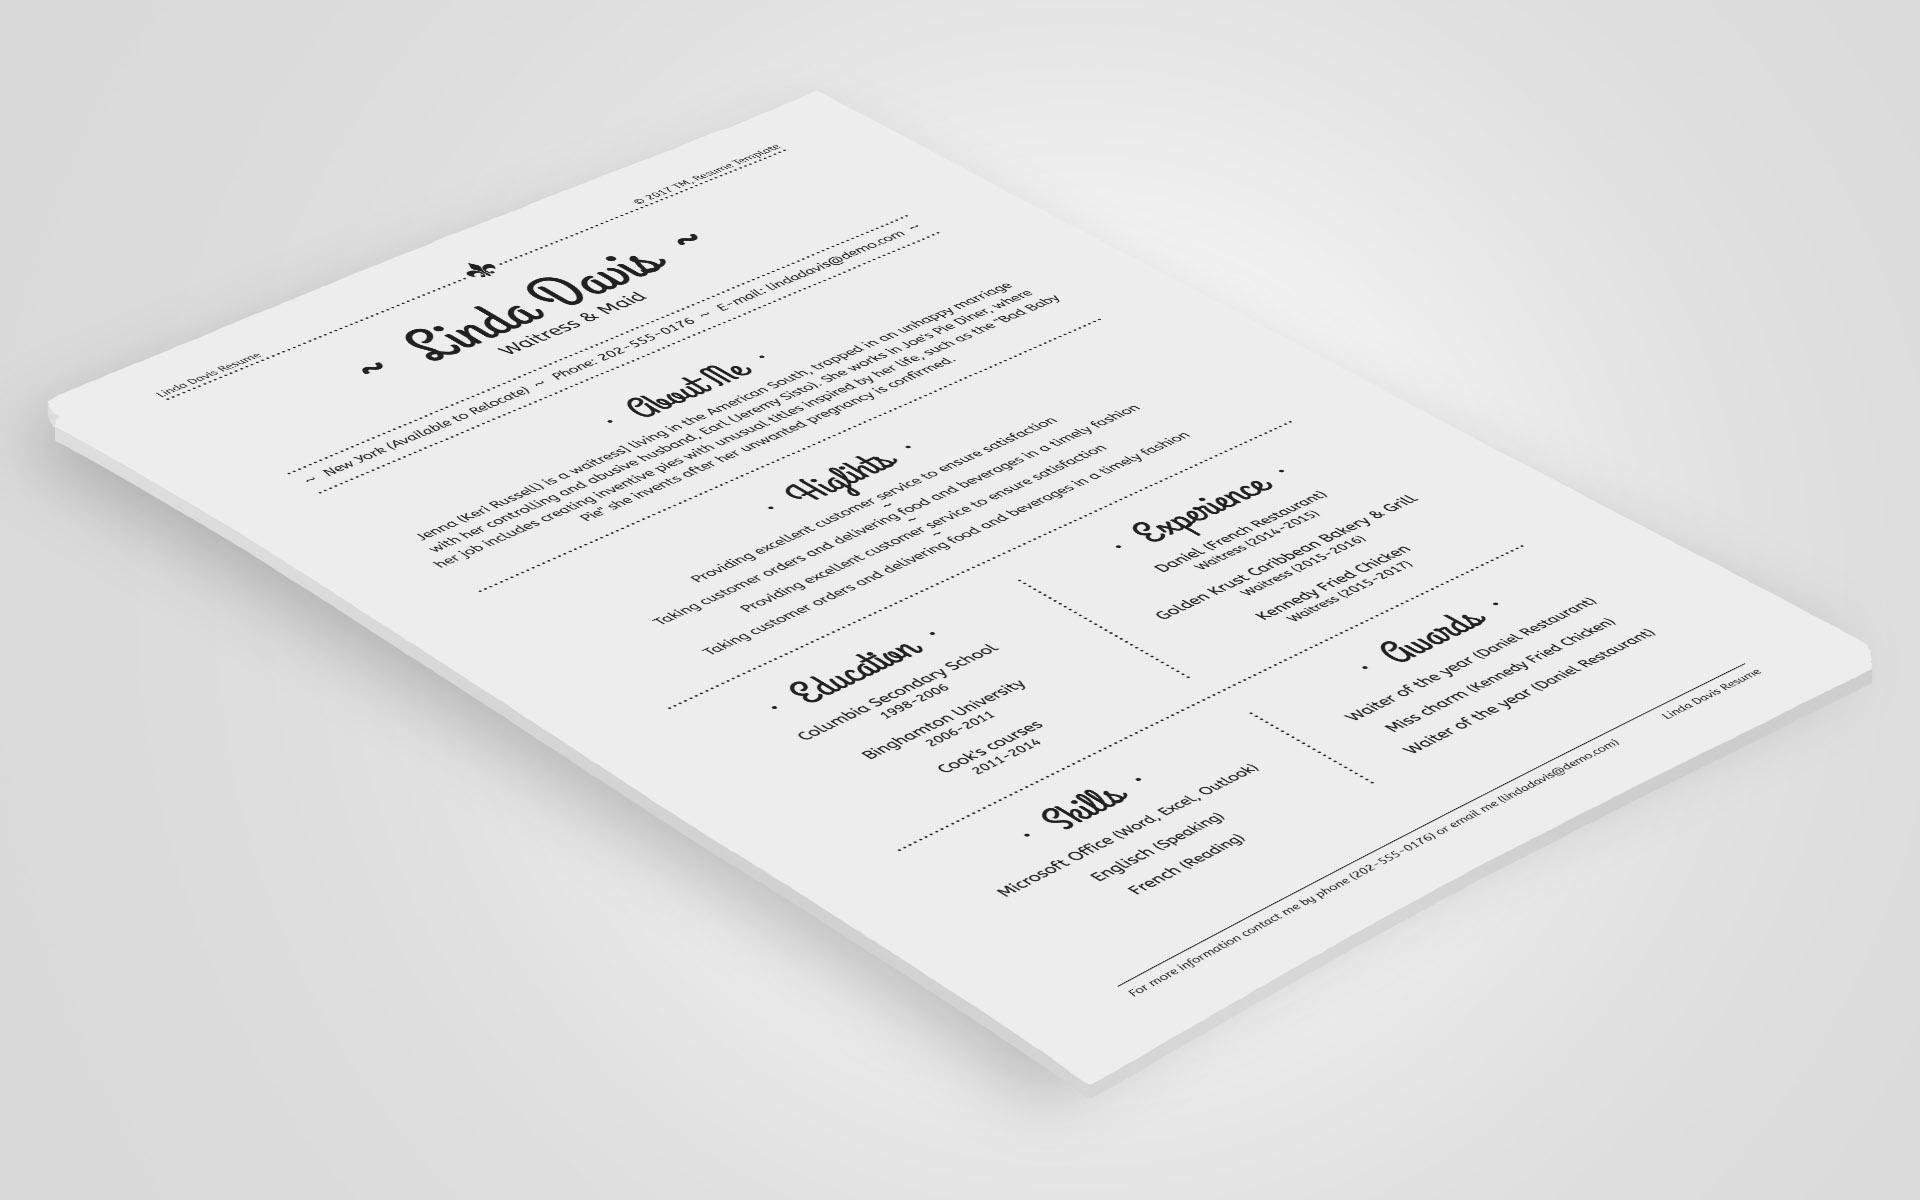 linda davis waitress maid resume template 64934